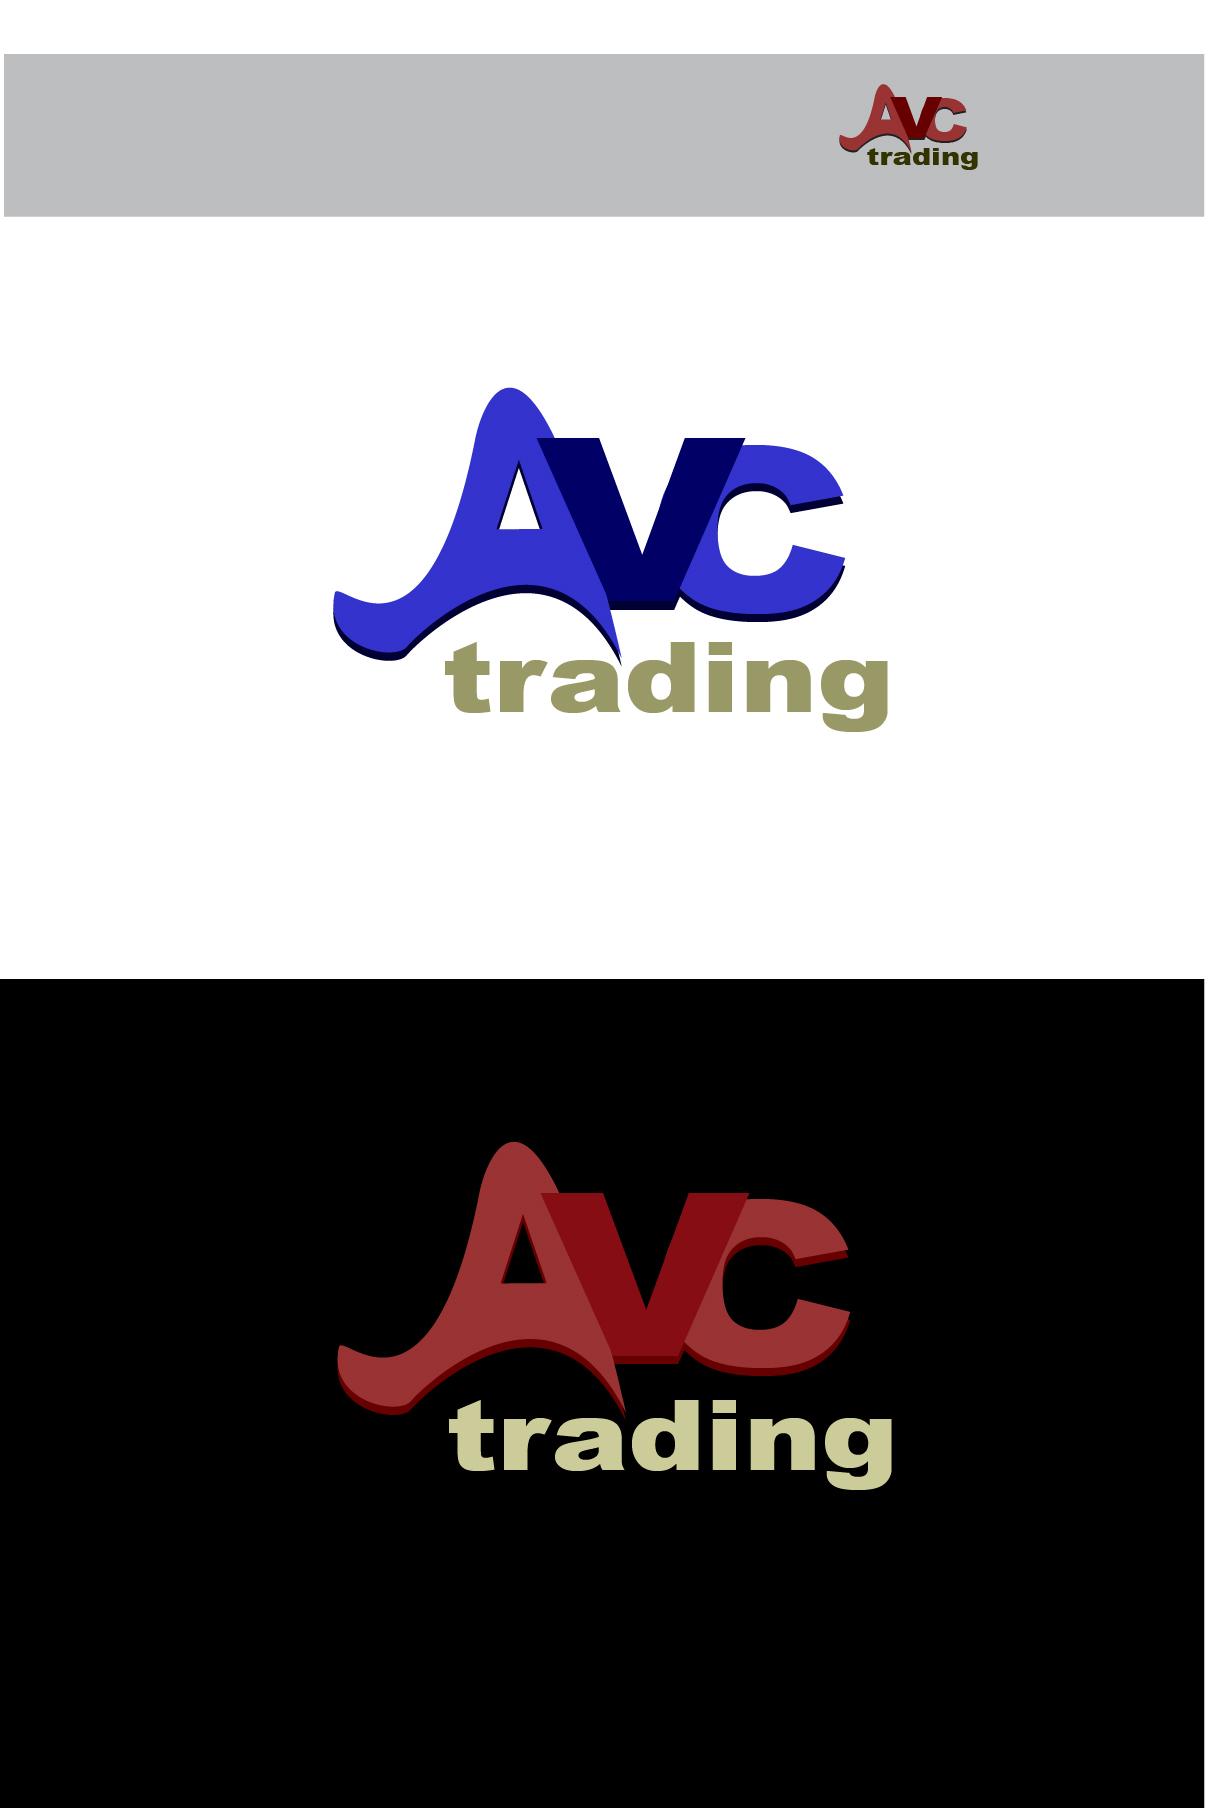 Logo Design by Nancy Grant - Entry No. 7 in the Logo Design Contest Fun Logo Design for ACV Trading.